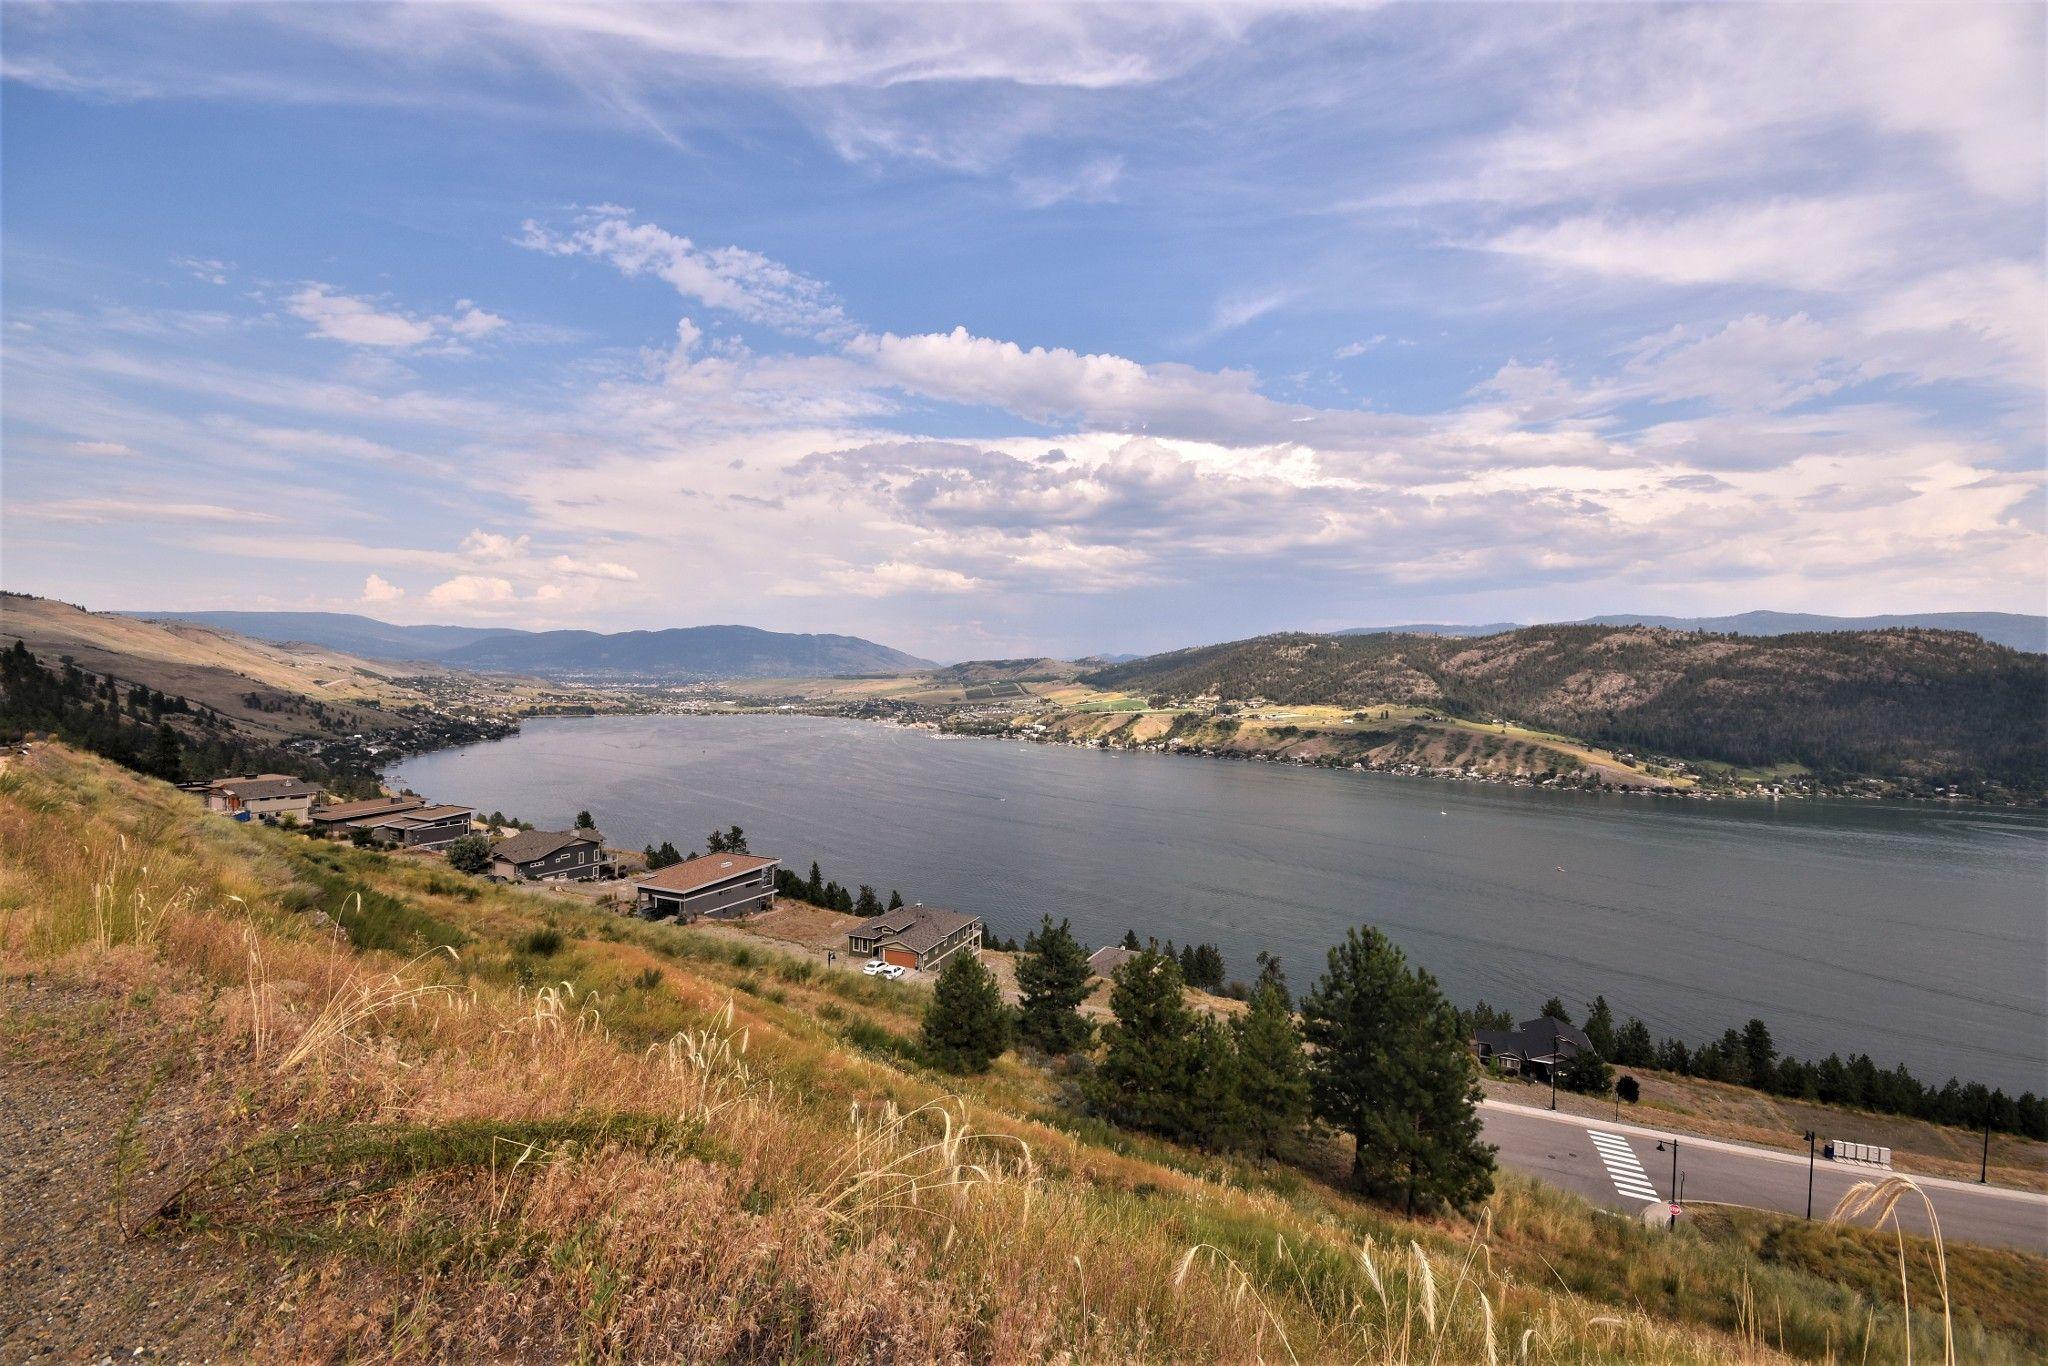 Main Photo: 8980 Hampshire Crescent in Vernon: Adventure Bay Vacant Land for sale (North Okanagan)  : MLS®# 10164249